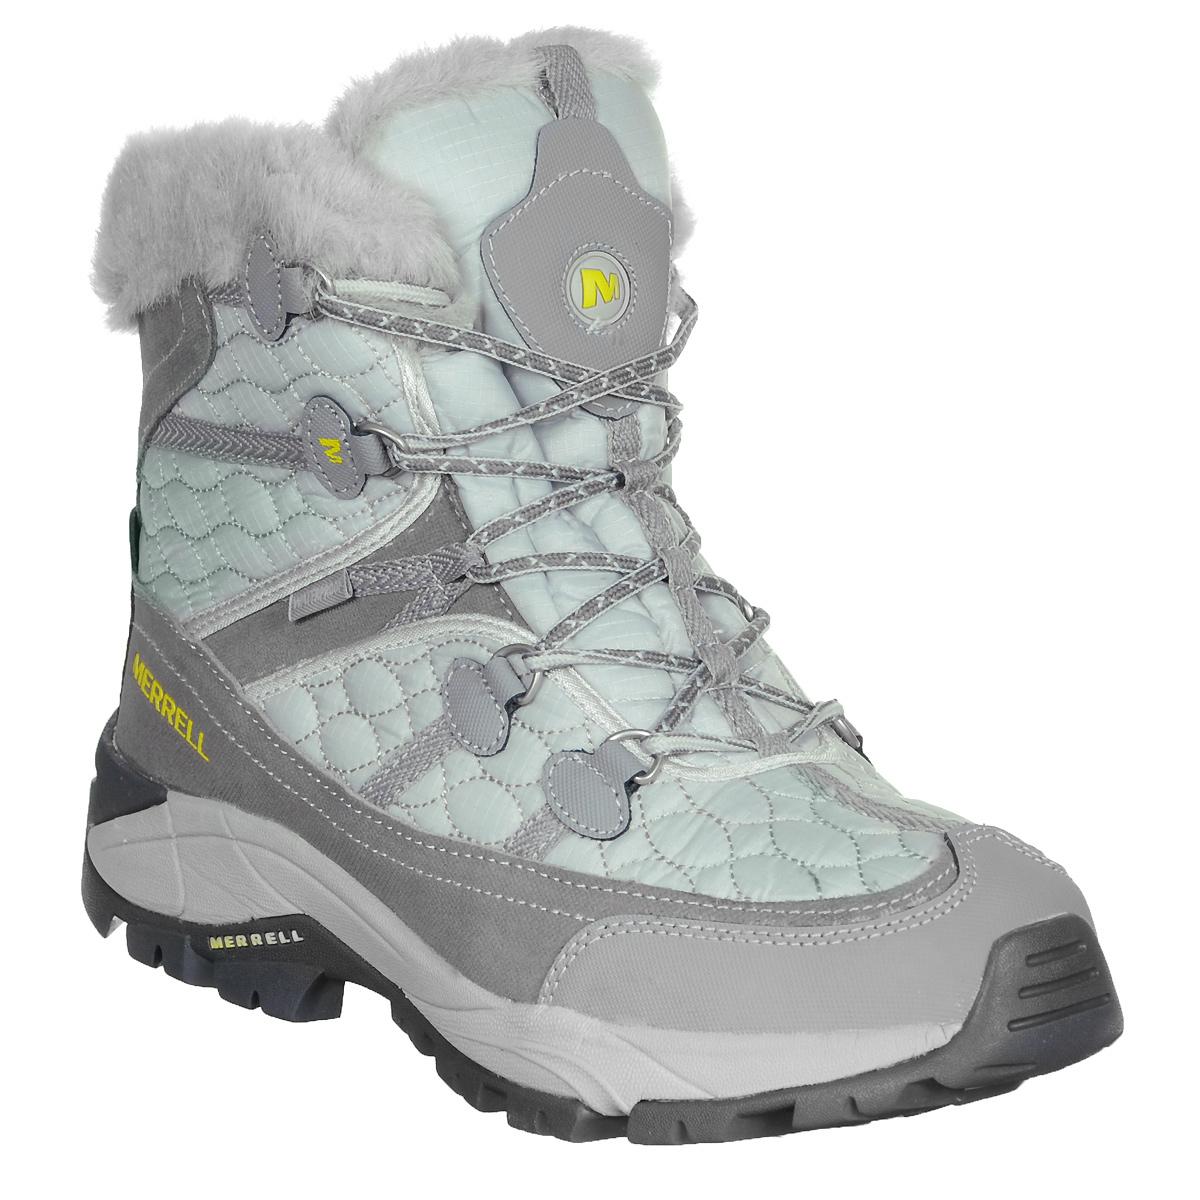 Ботинки Merrell J097132C